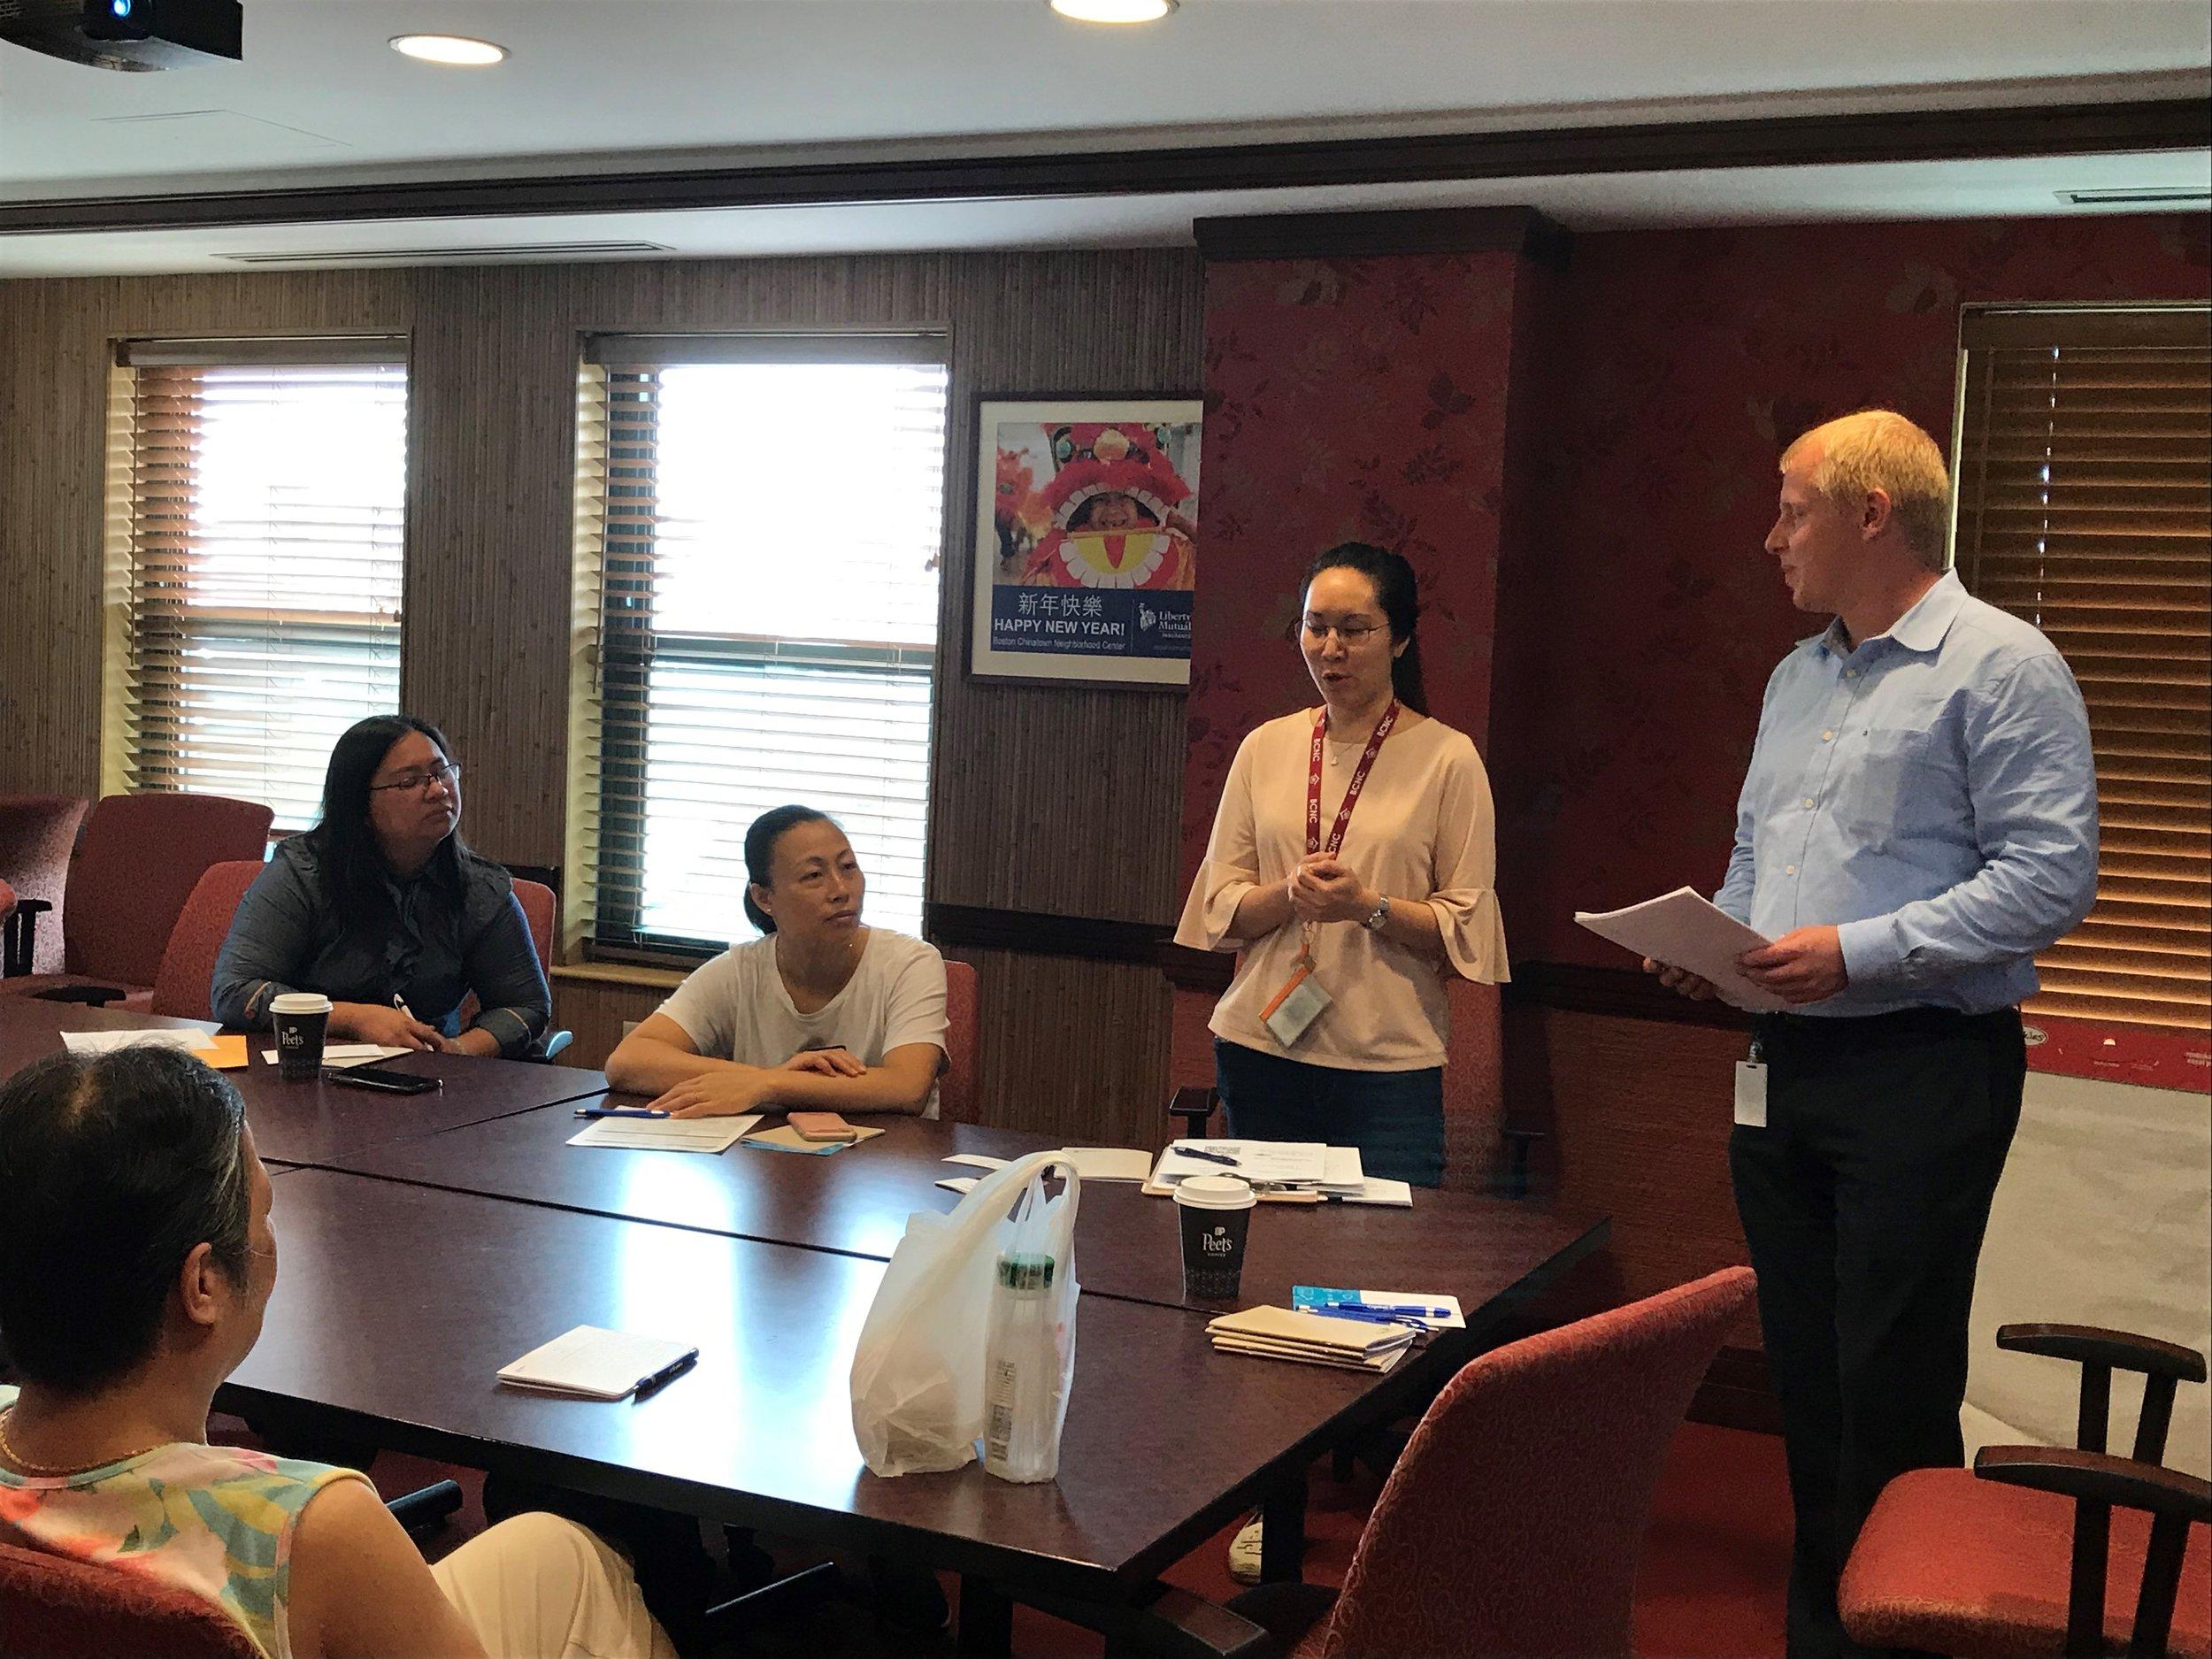 2019.08.22 CapitalOne Financial Workshop (1).jpg